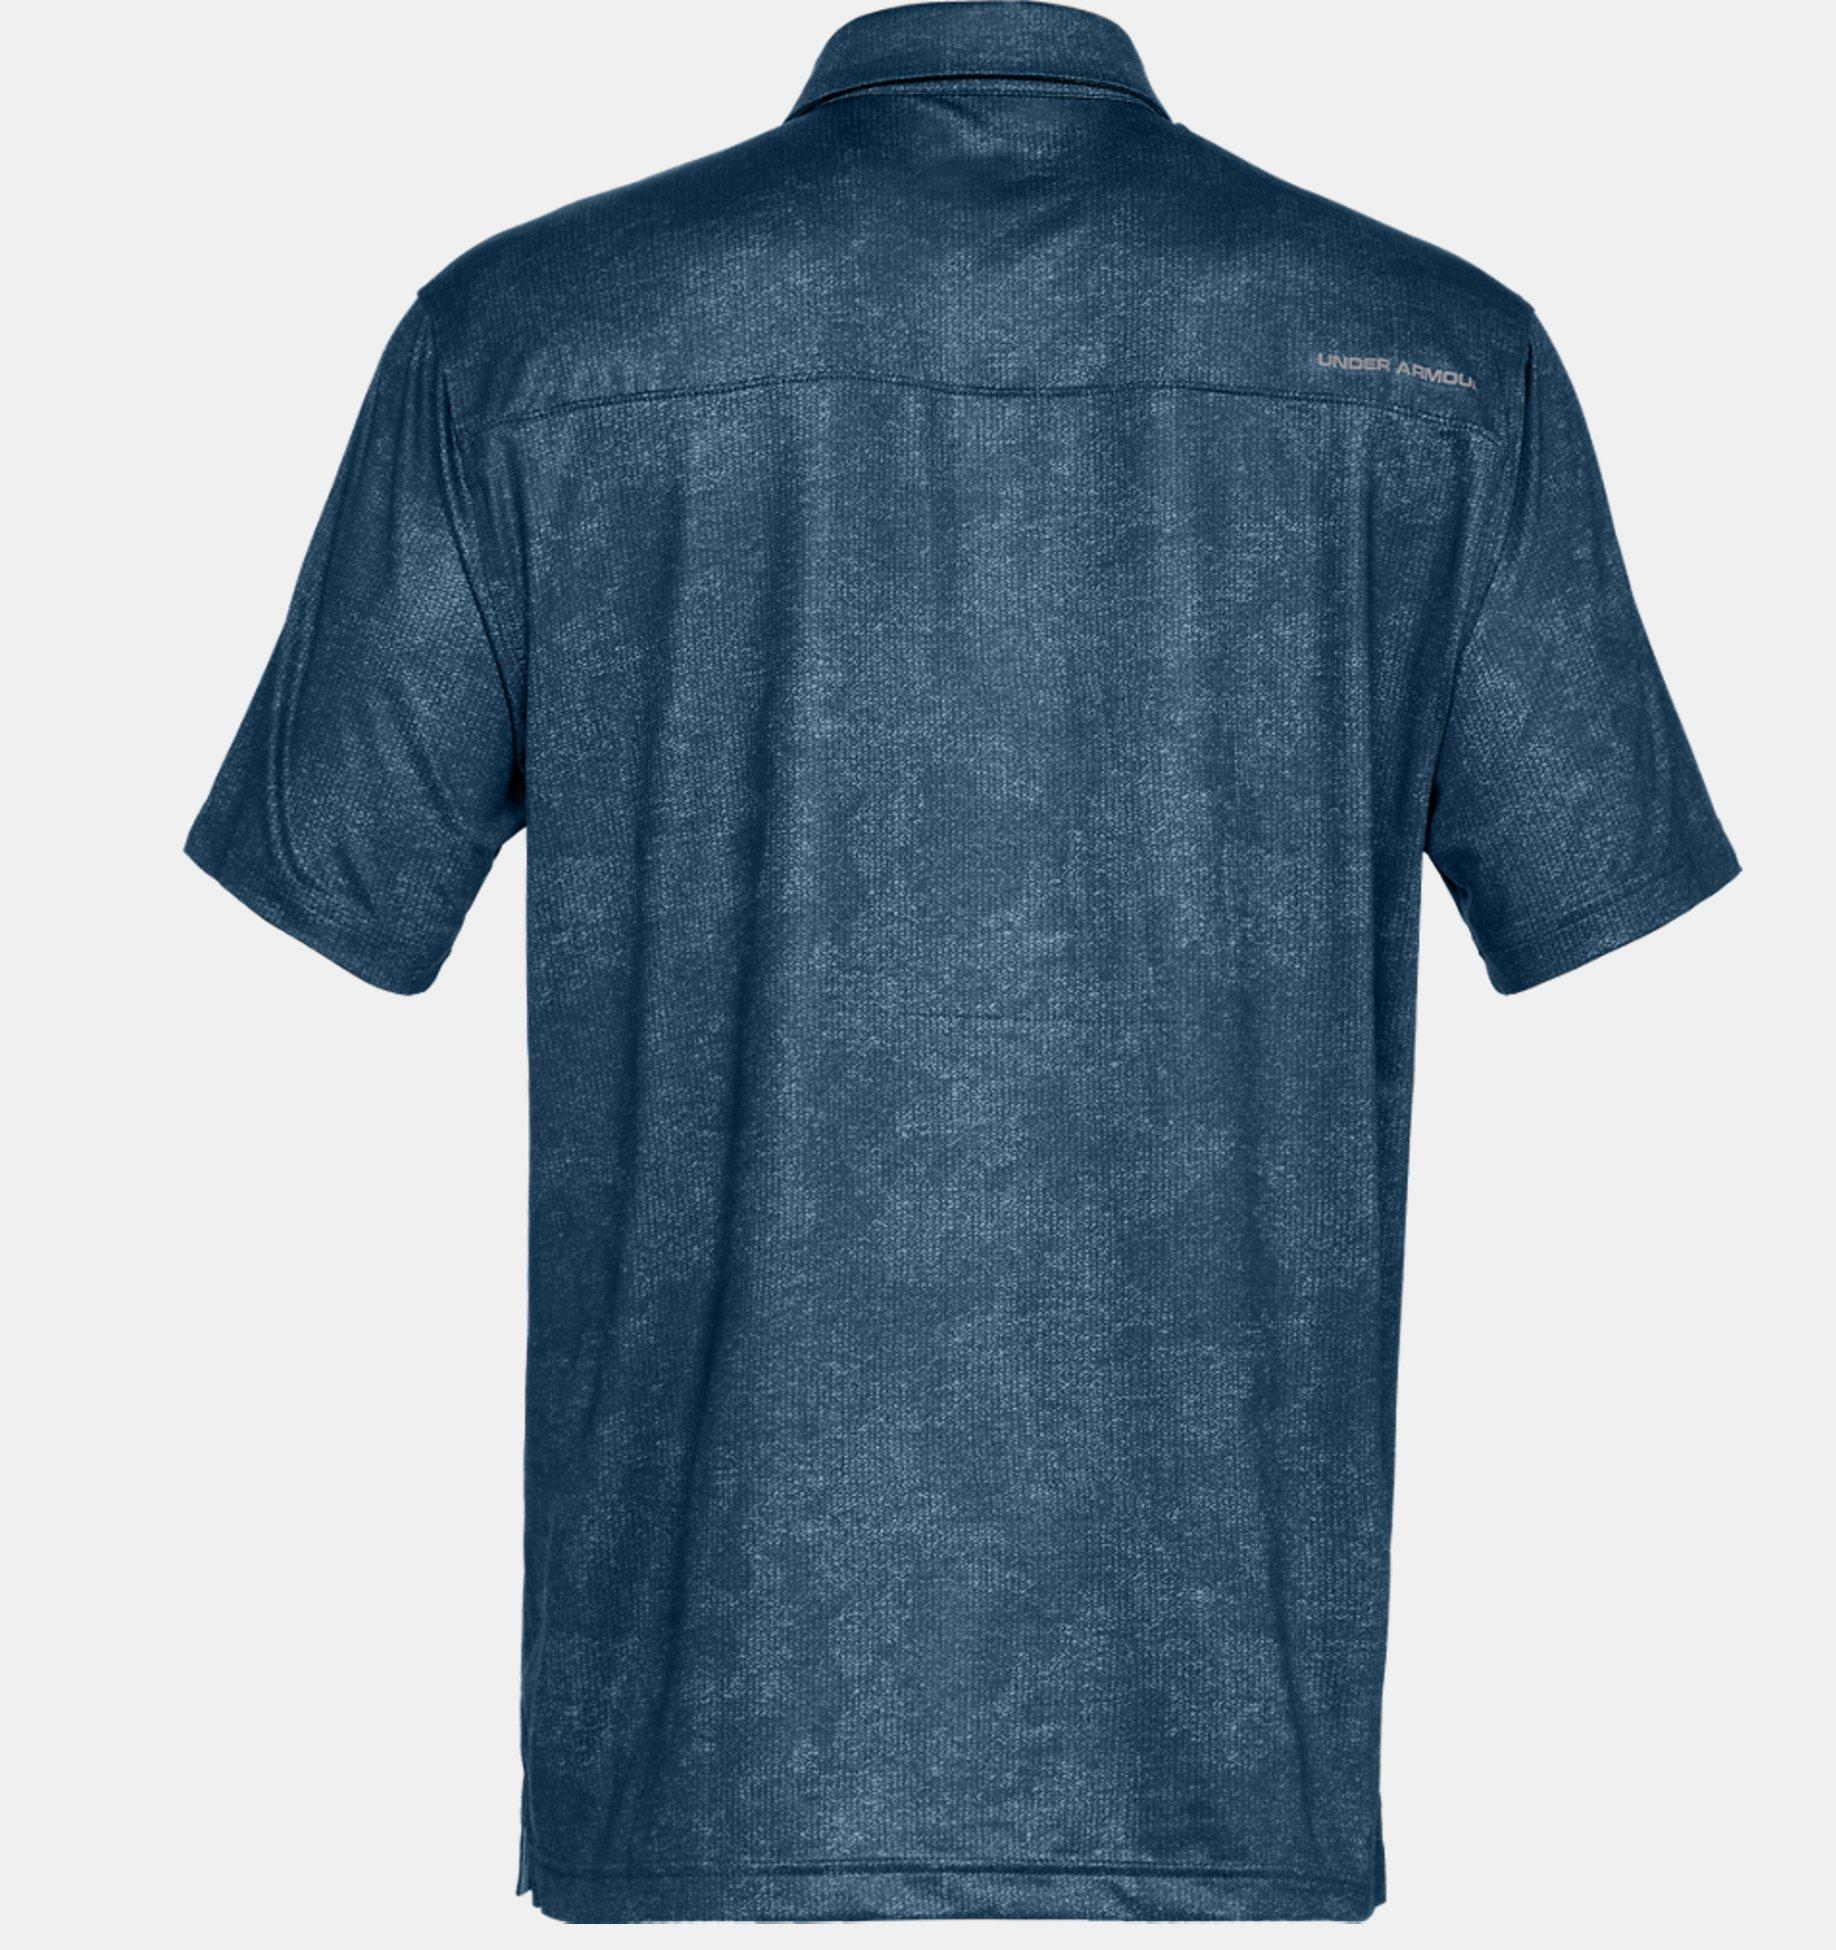 2599a9b799 Men's UA Playoff Polo Tweed | Under Armour ID